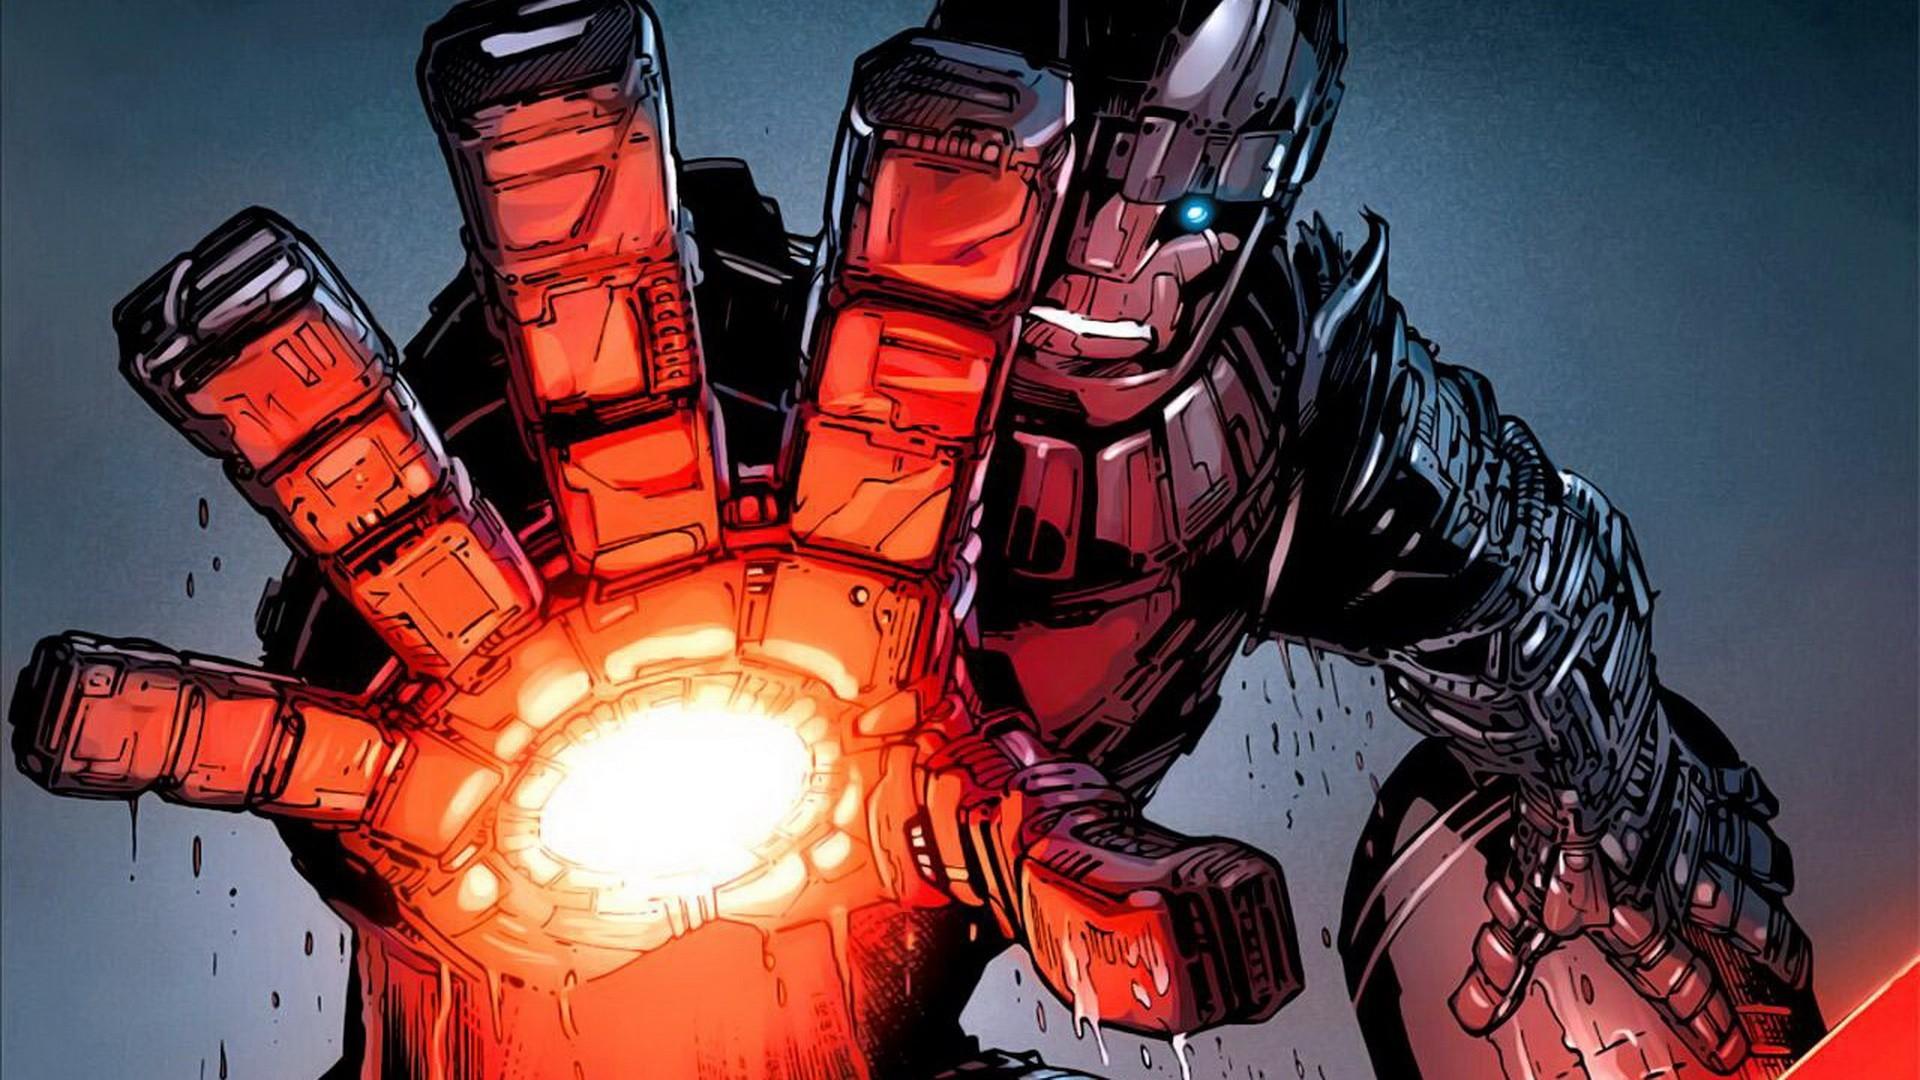 Wallpaper X-Men, sentinel, marvel comics, robot, cyborg, villain